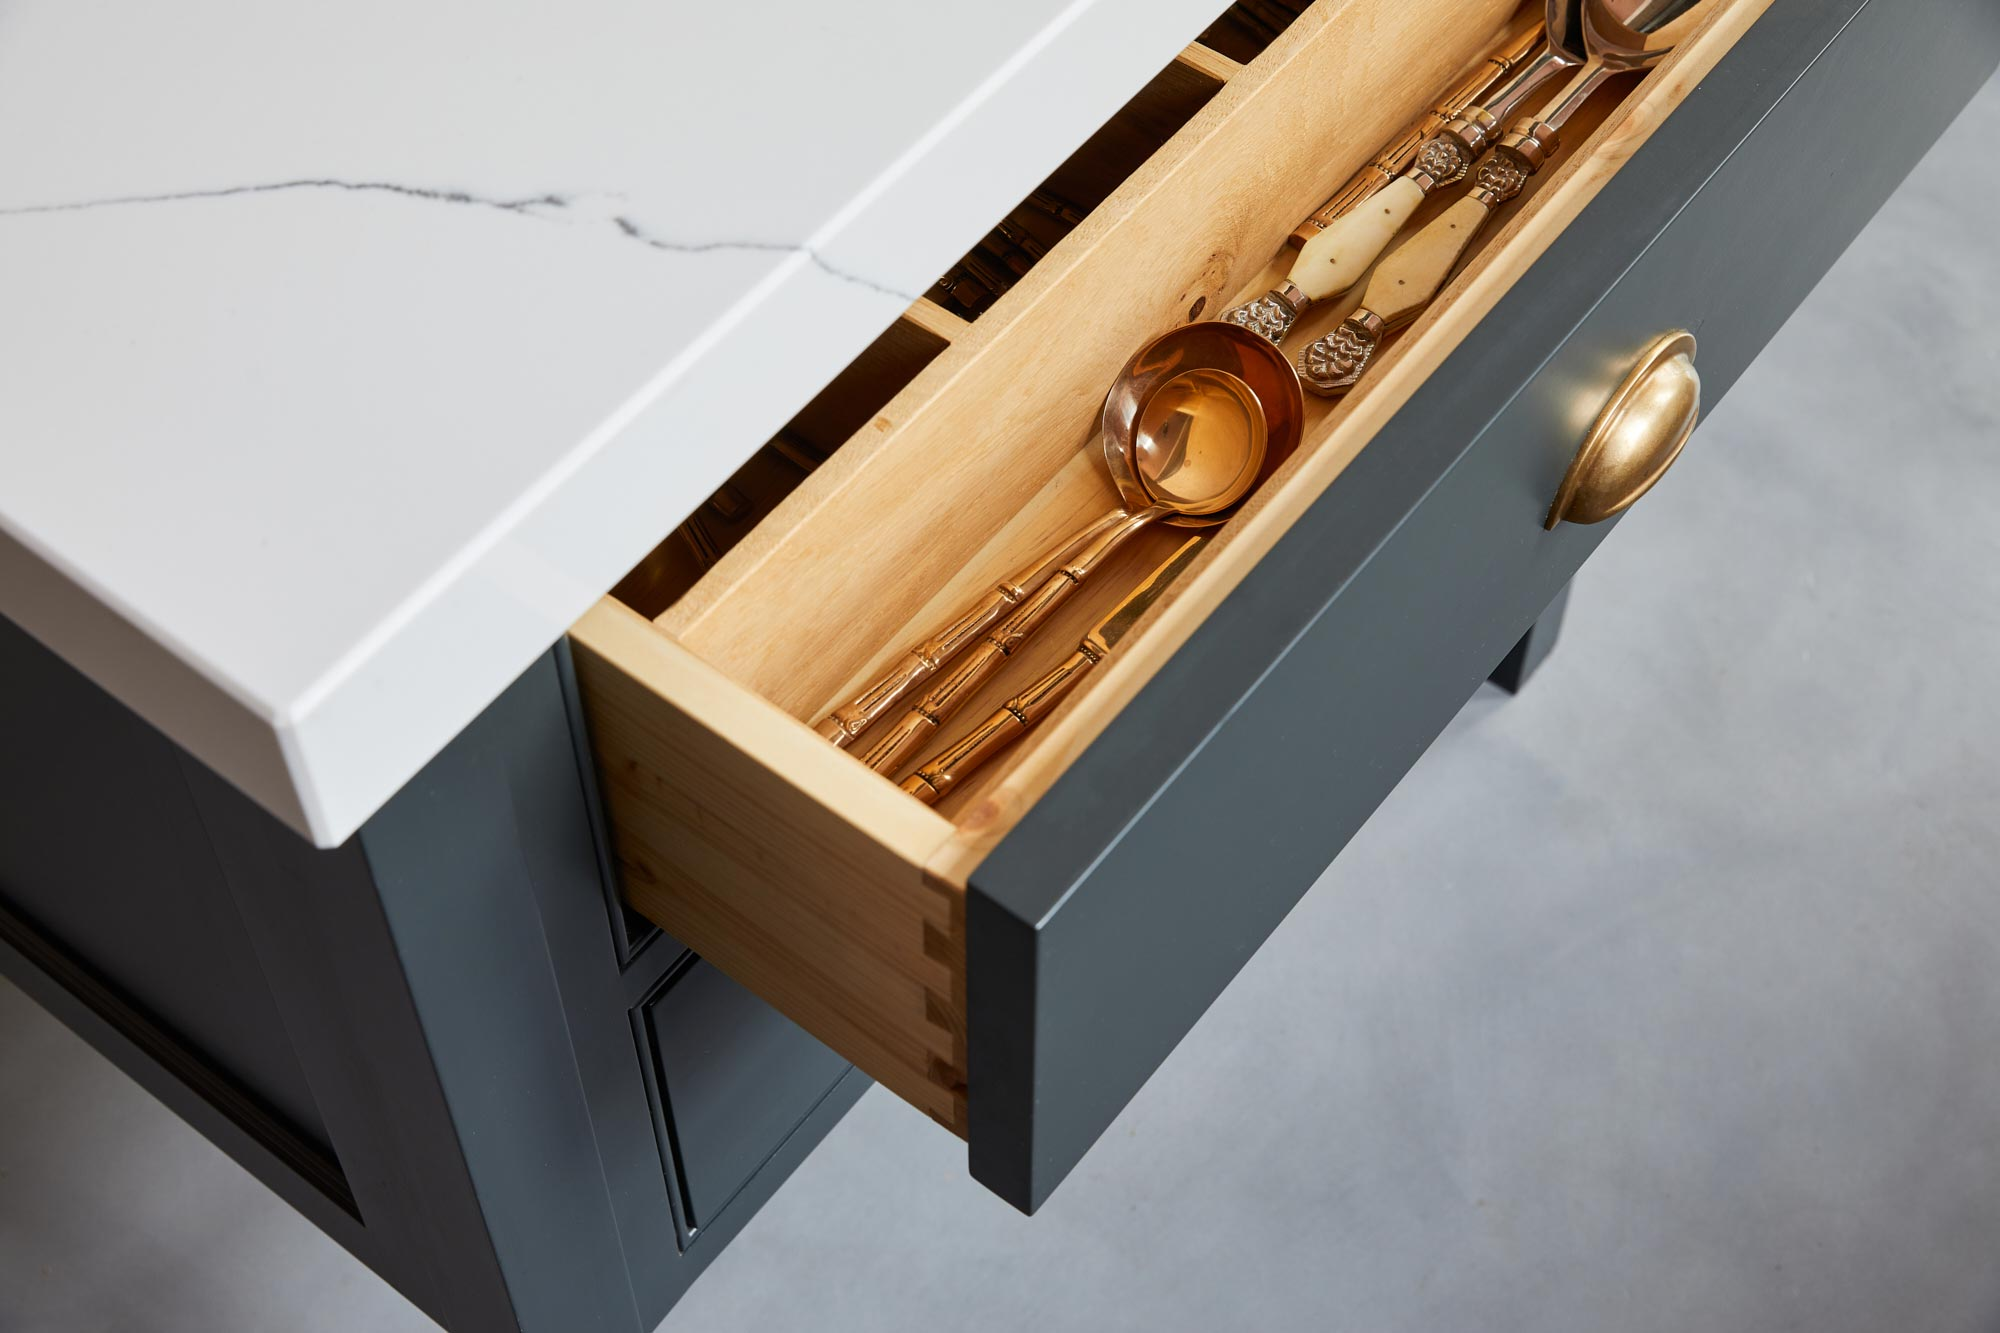 Bespoke kitchen drawer insert